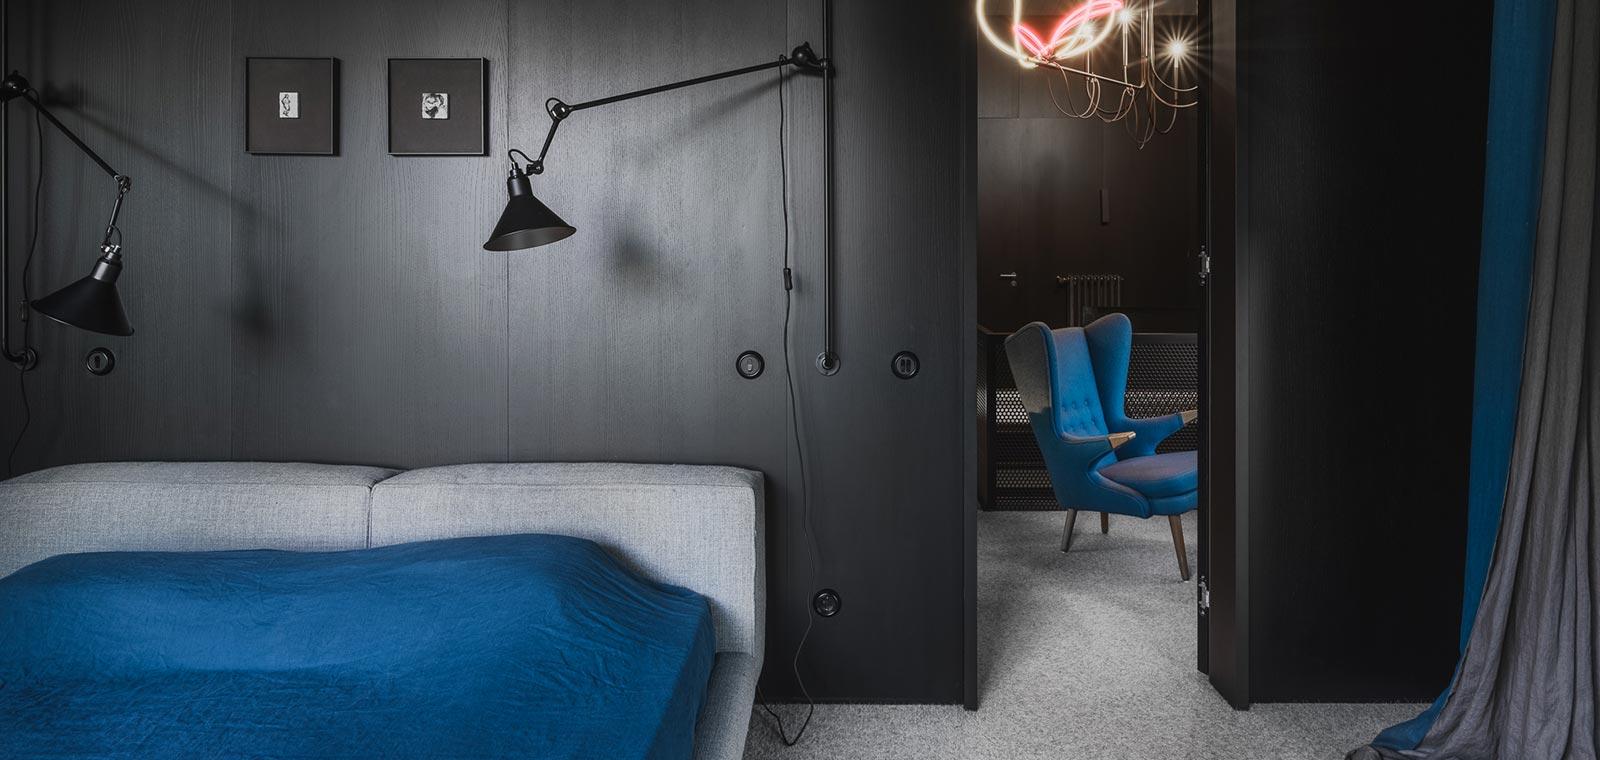 Prefab timber house in Riga, Latvia designed by Open AD - bedroom design idea